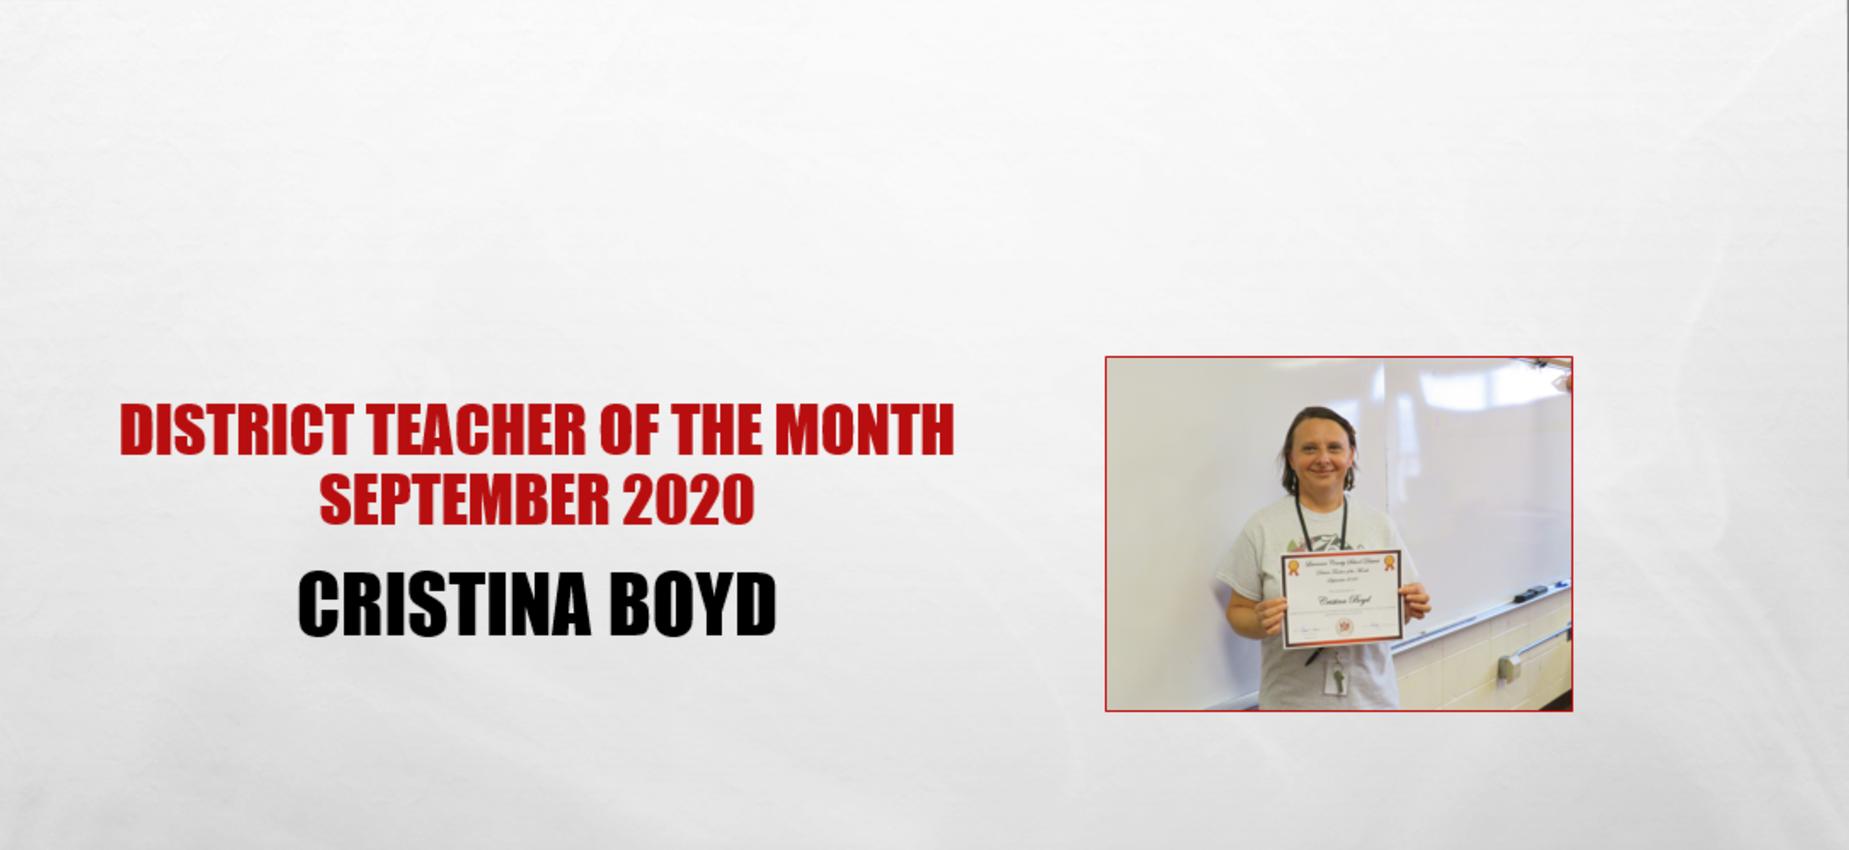 Cristina Boyd Teacher of the Month September 2020